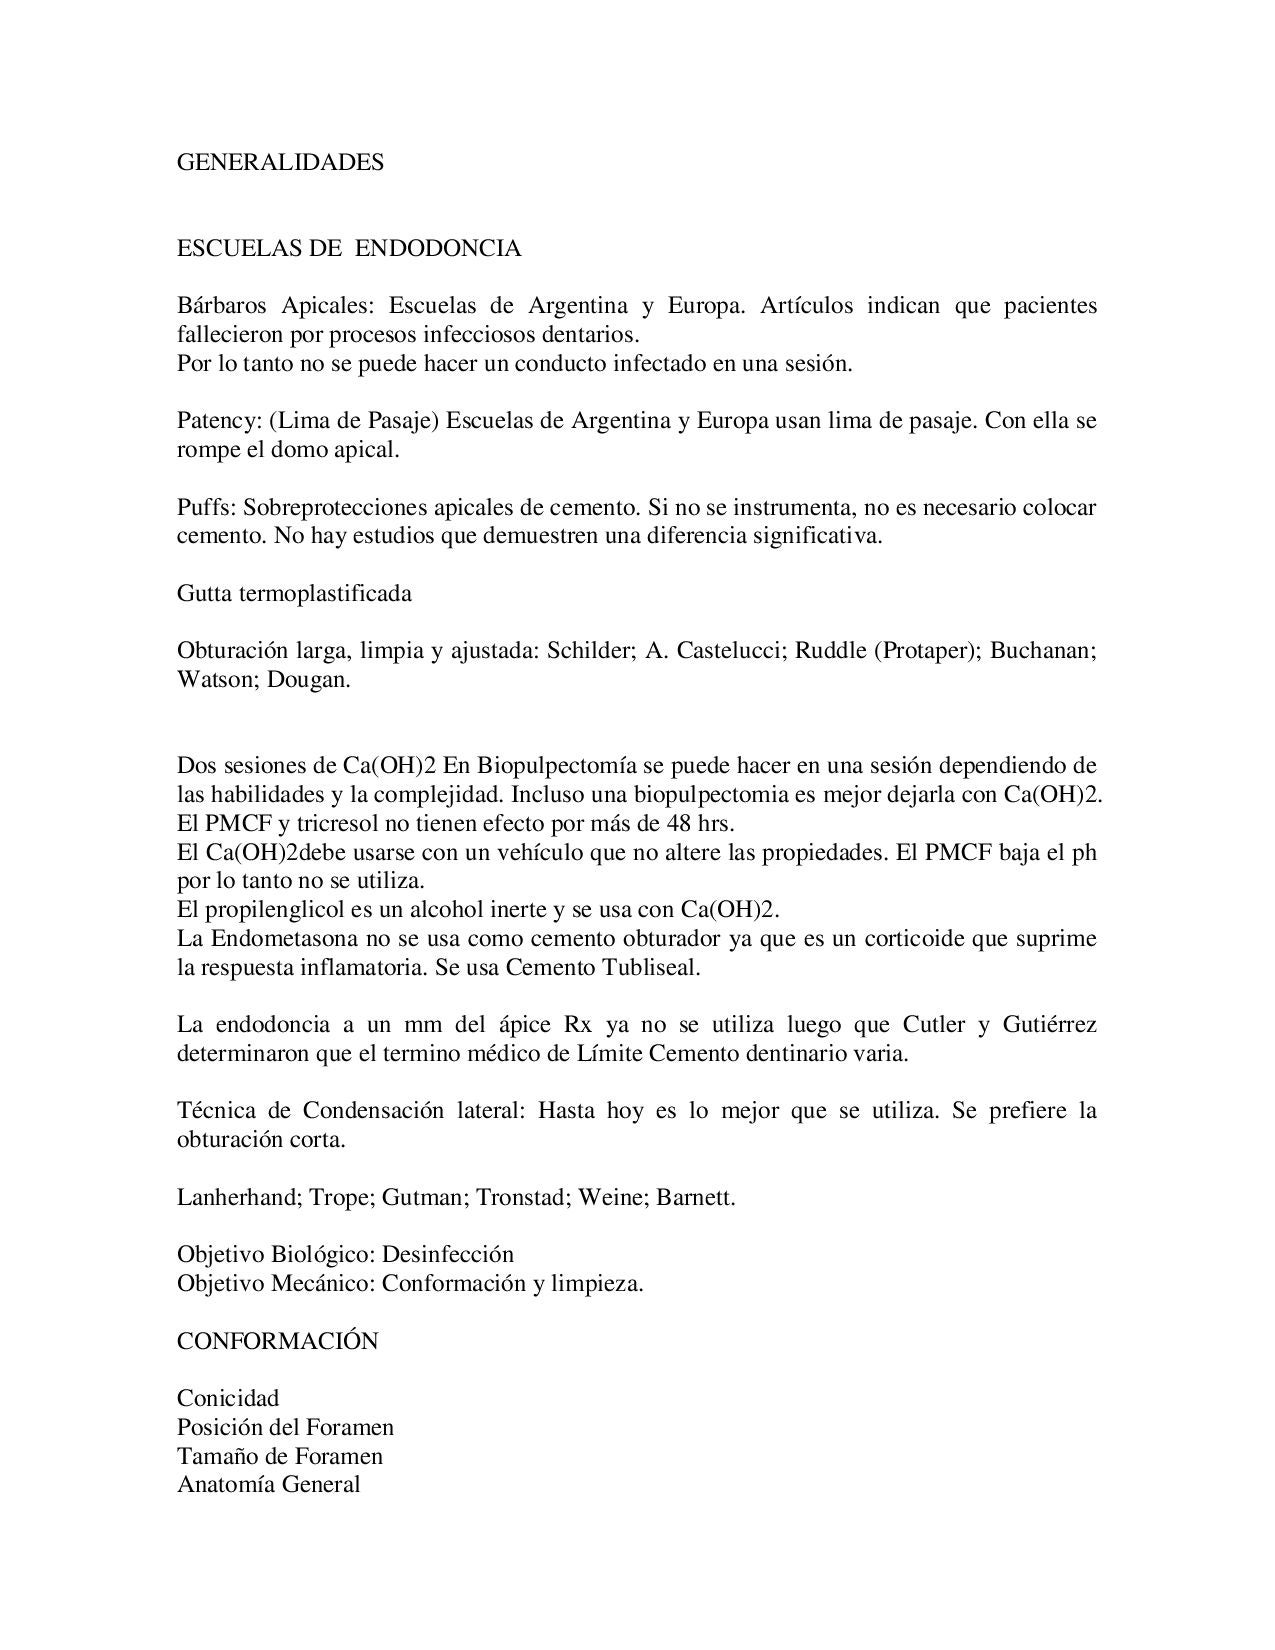 GENERALIDADES DE ENDODONCIA by GABRIELA SANCHEZ - issuu